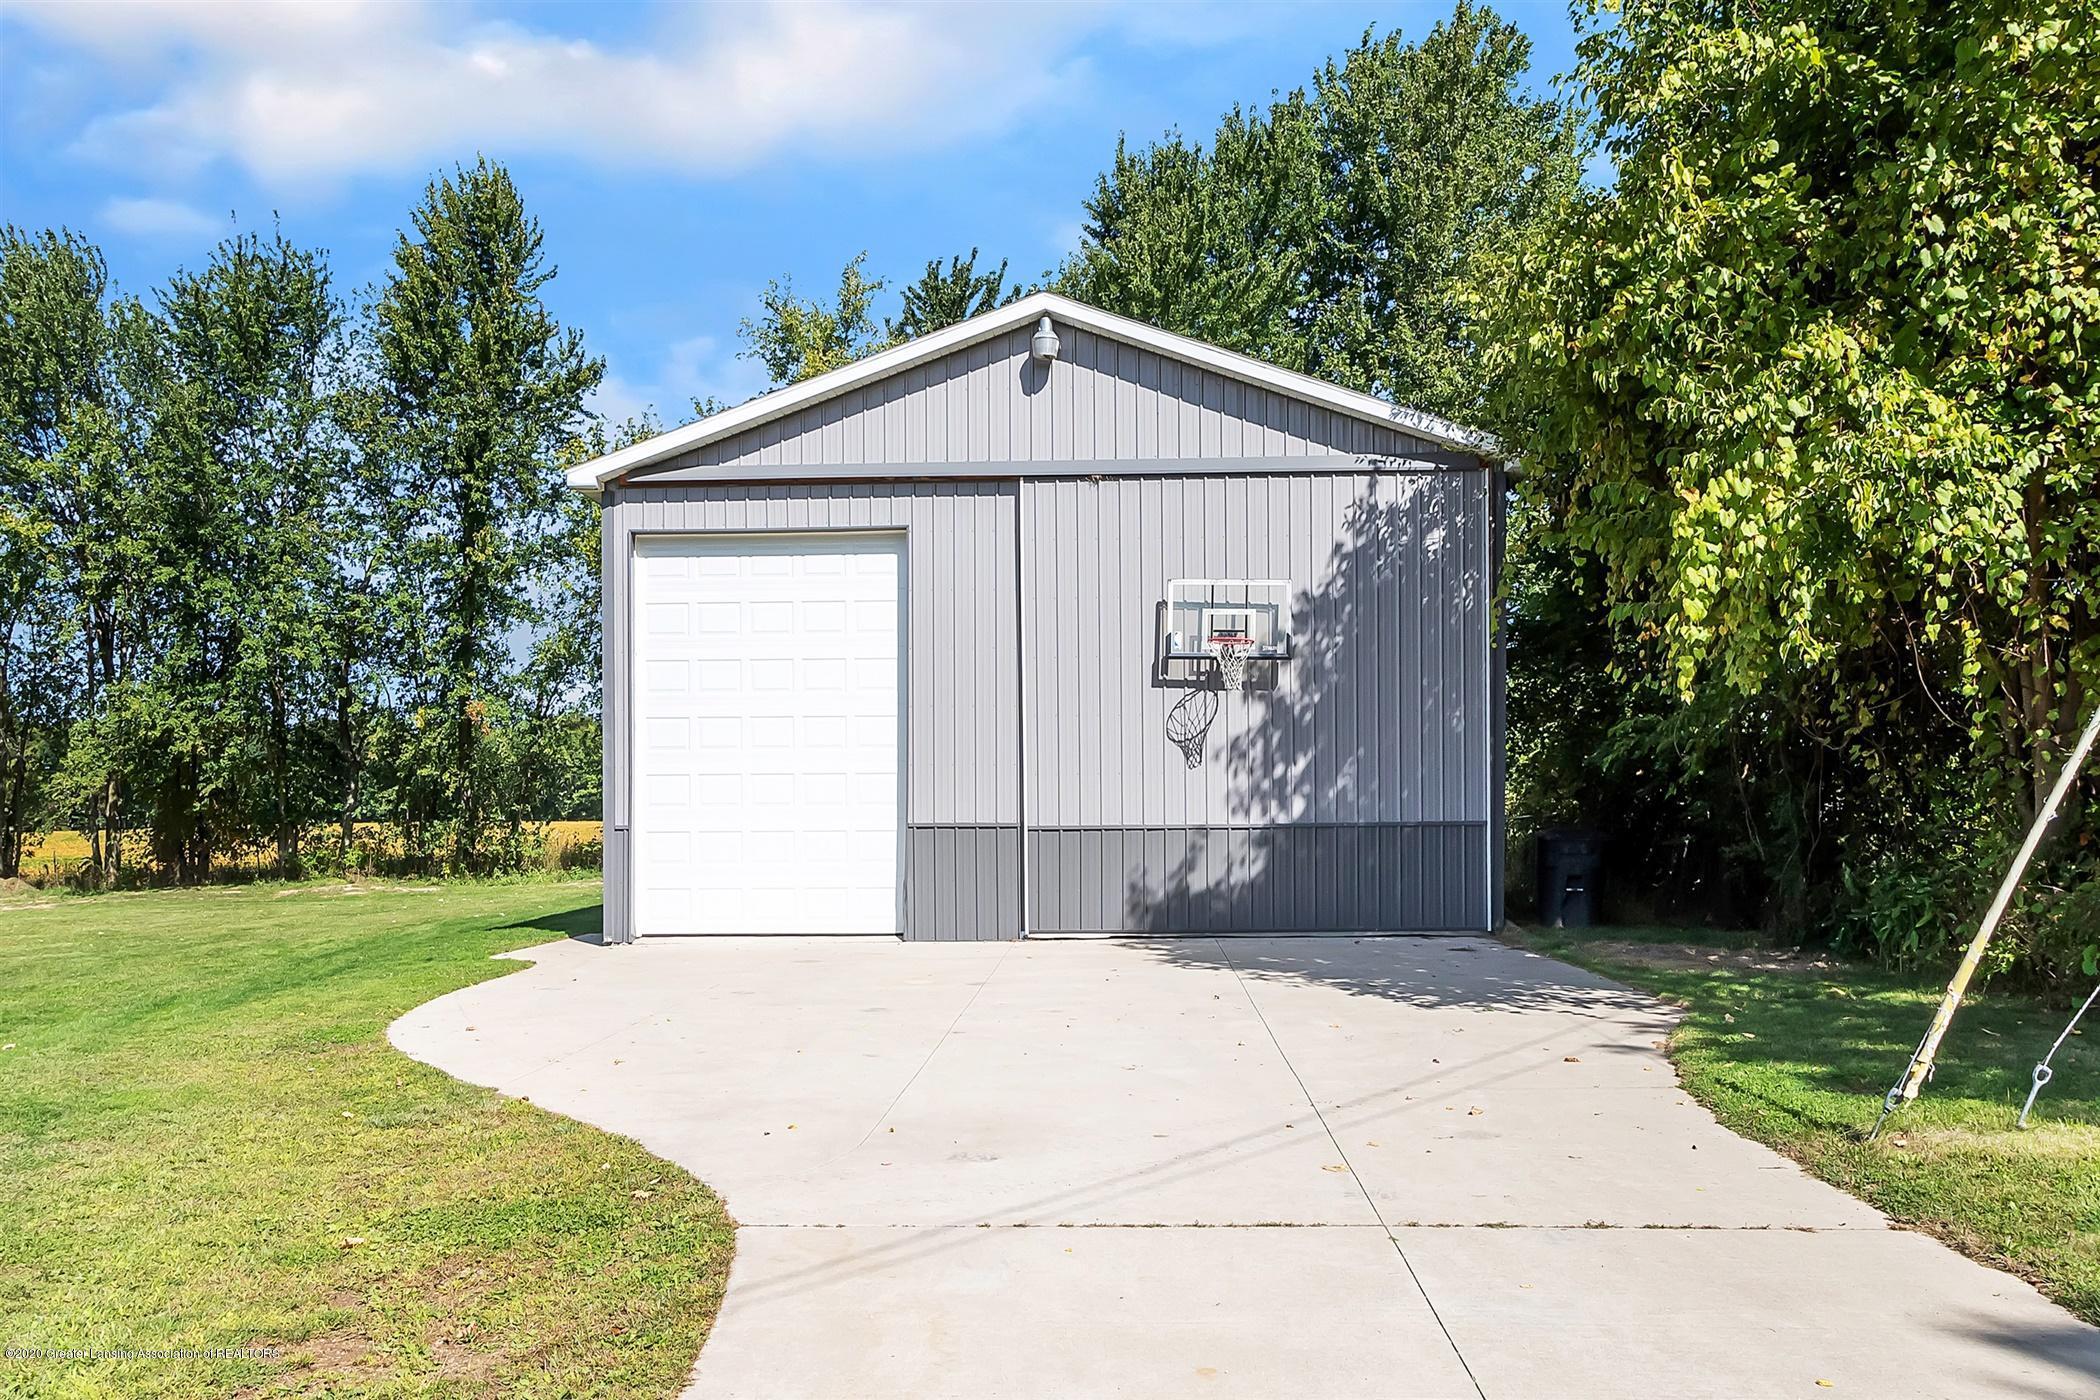 7346 W Cutler Rd - POLE BARN 2014 - 57